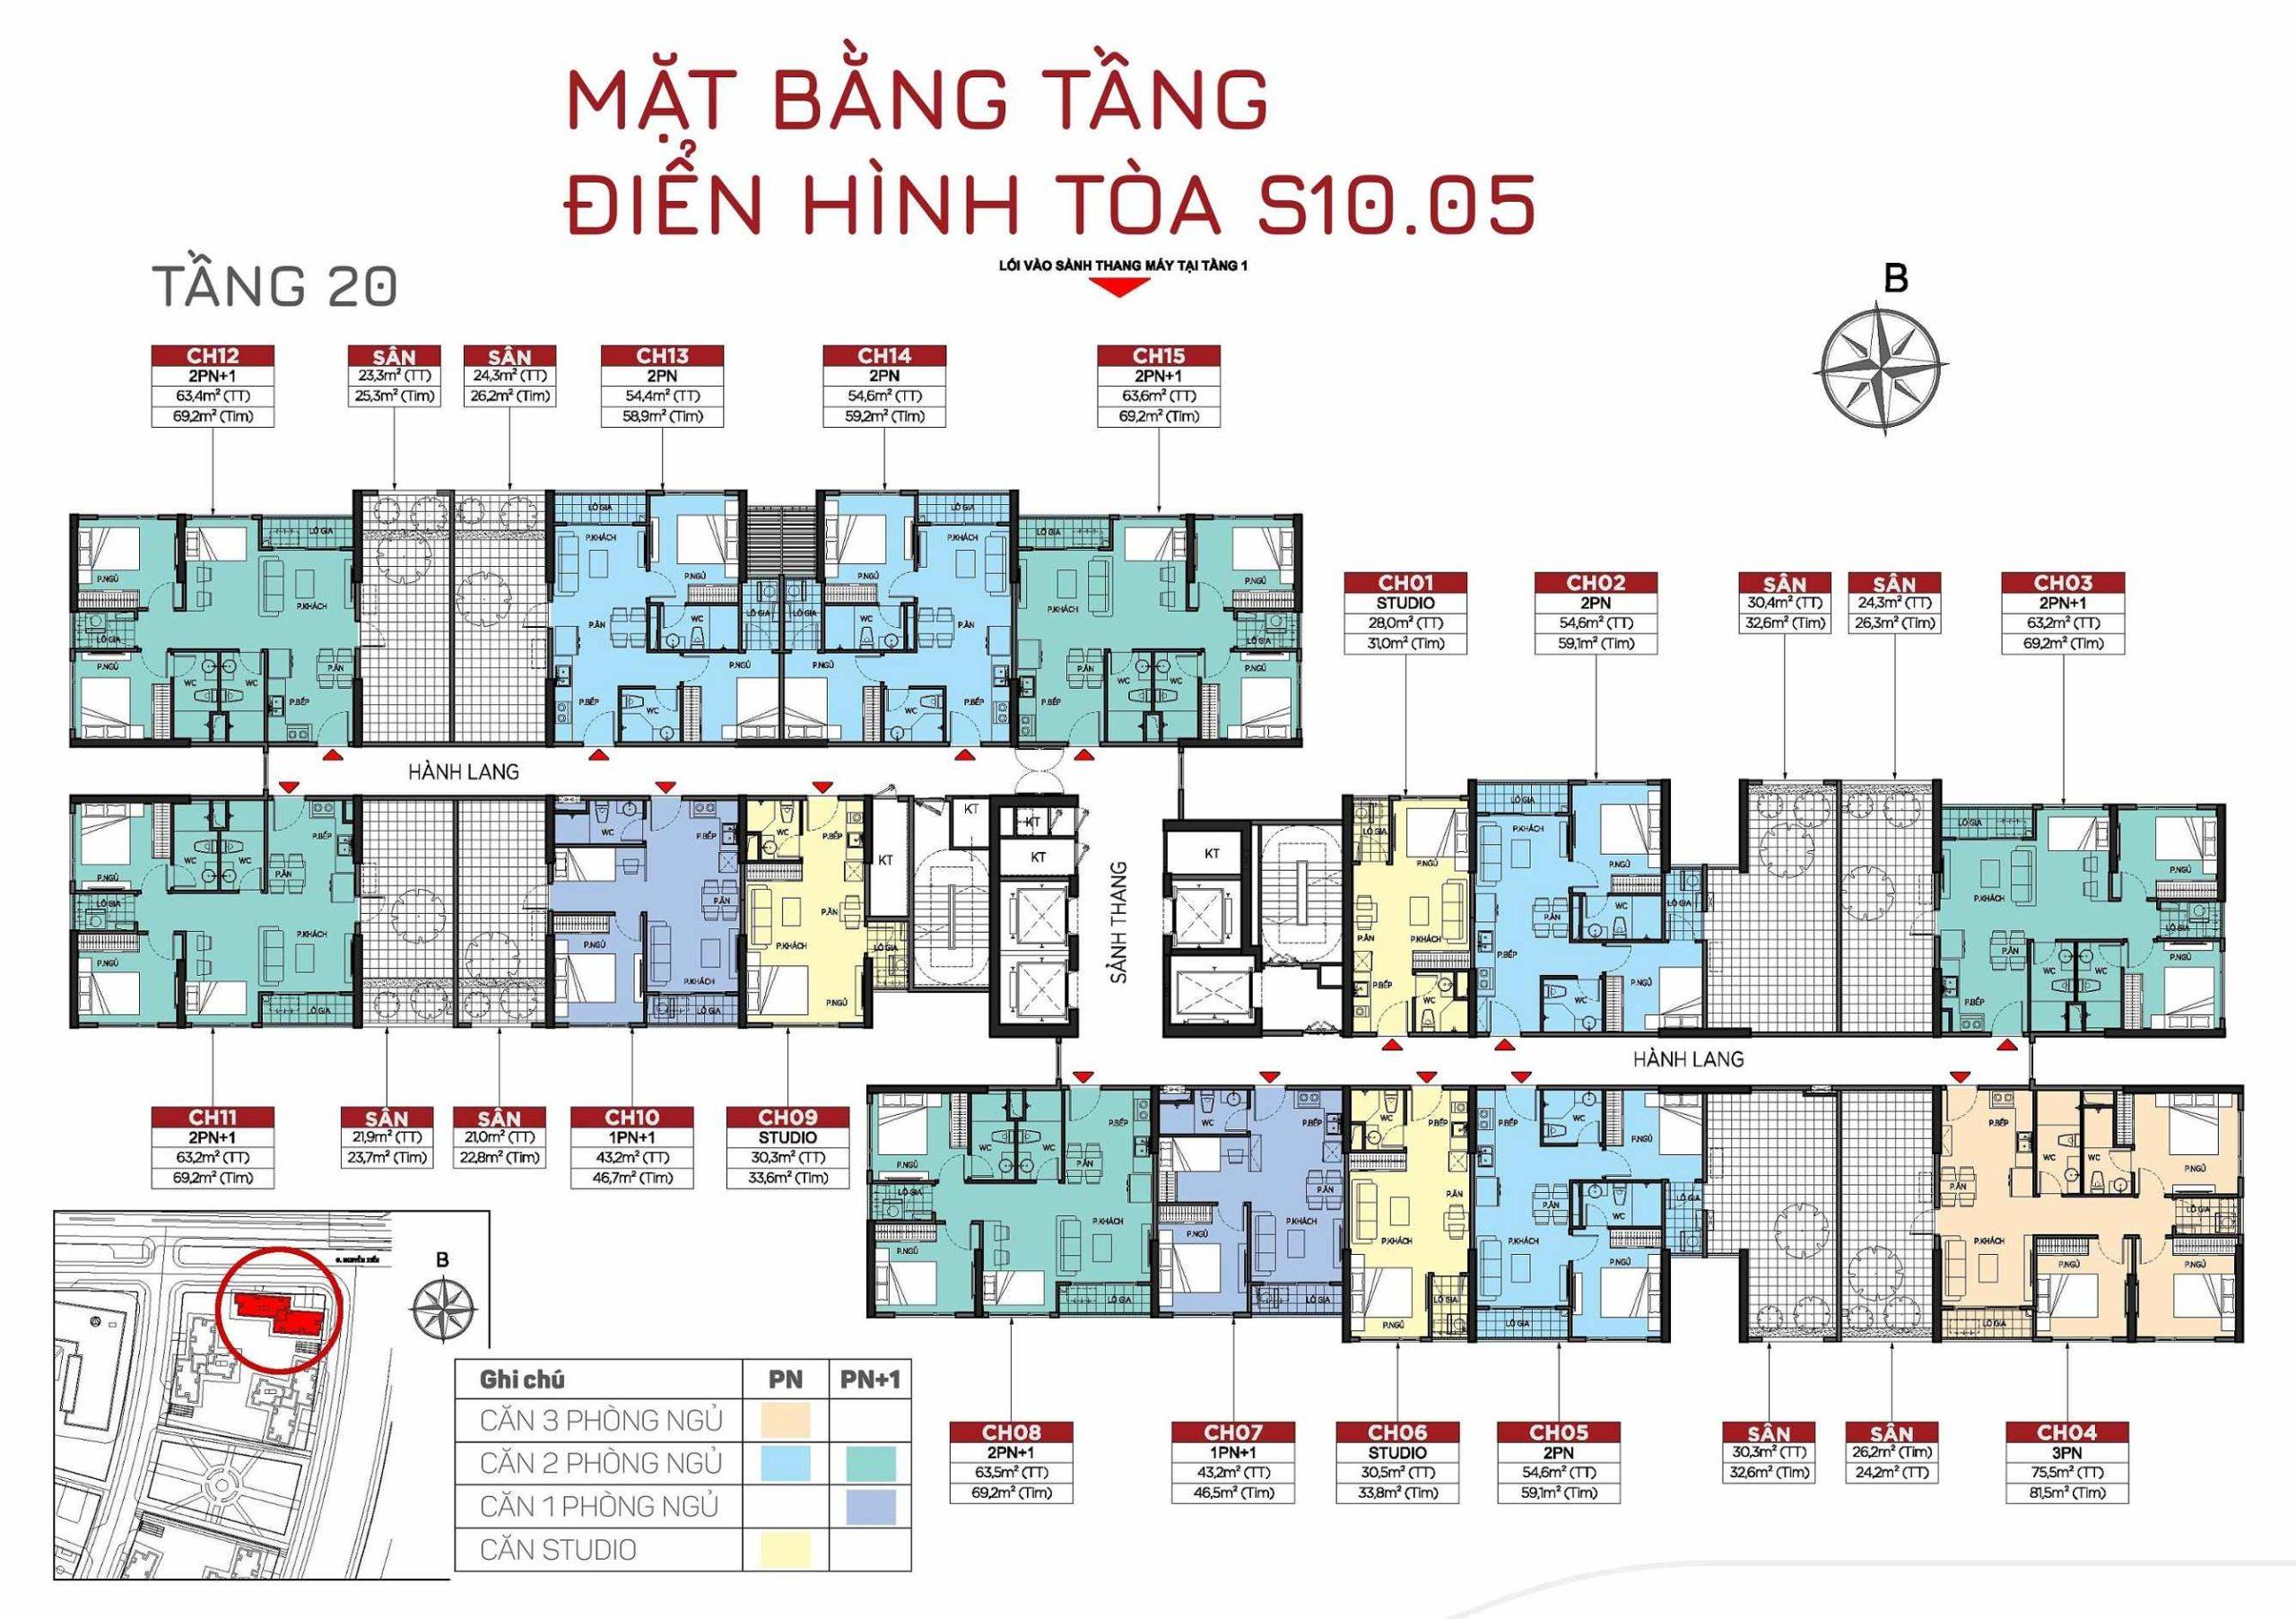 Mat-bang-s1005-the-origami-tang-20